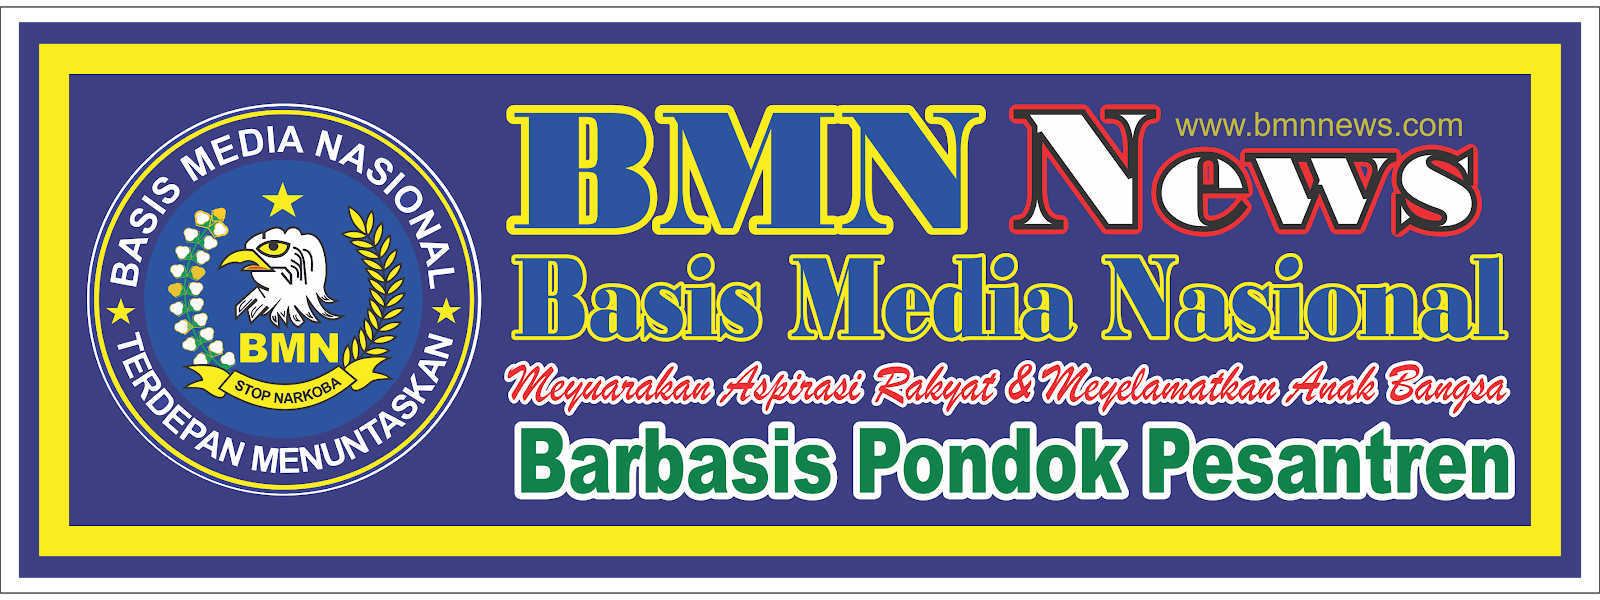 Basis Media Nasional